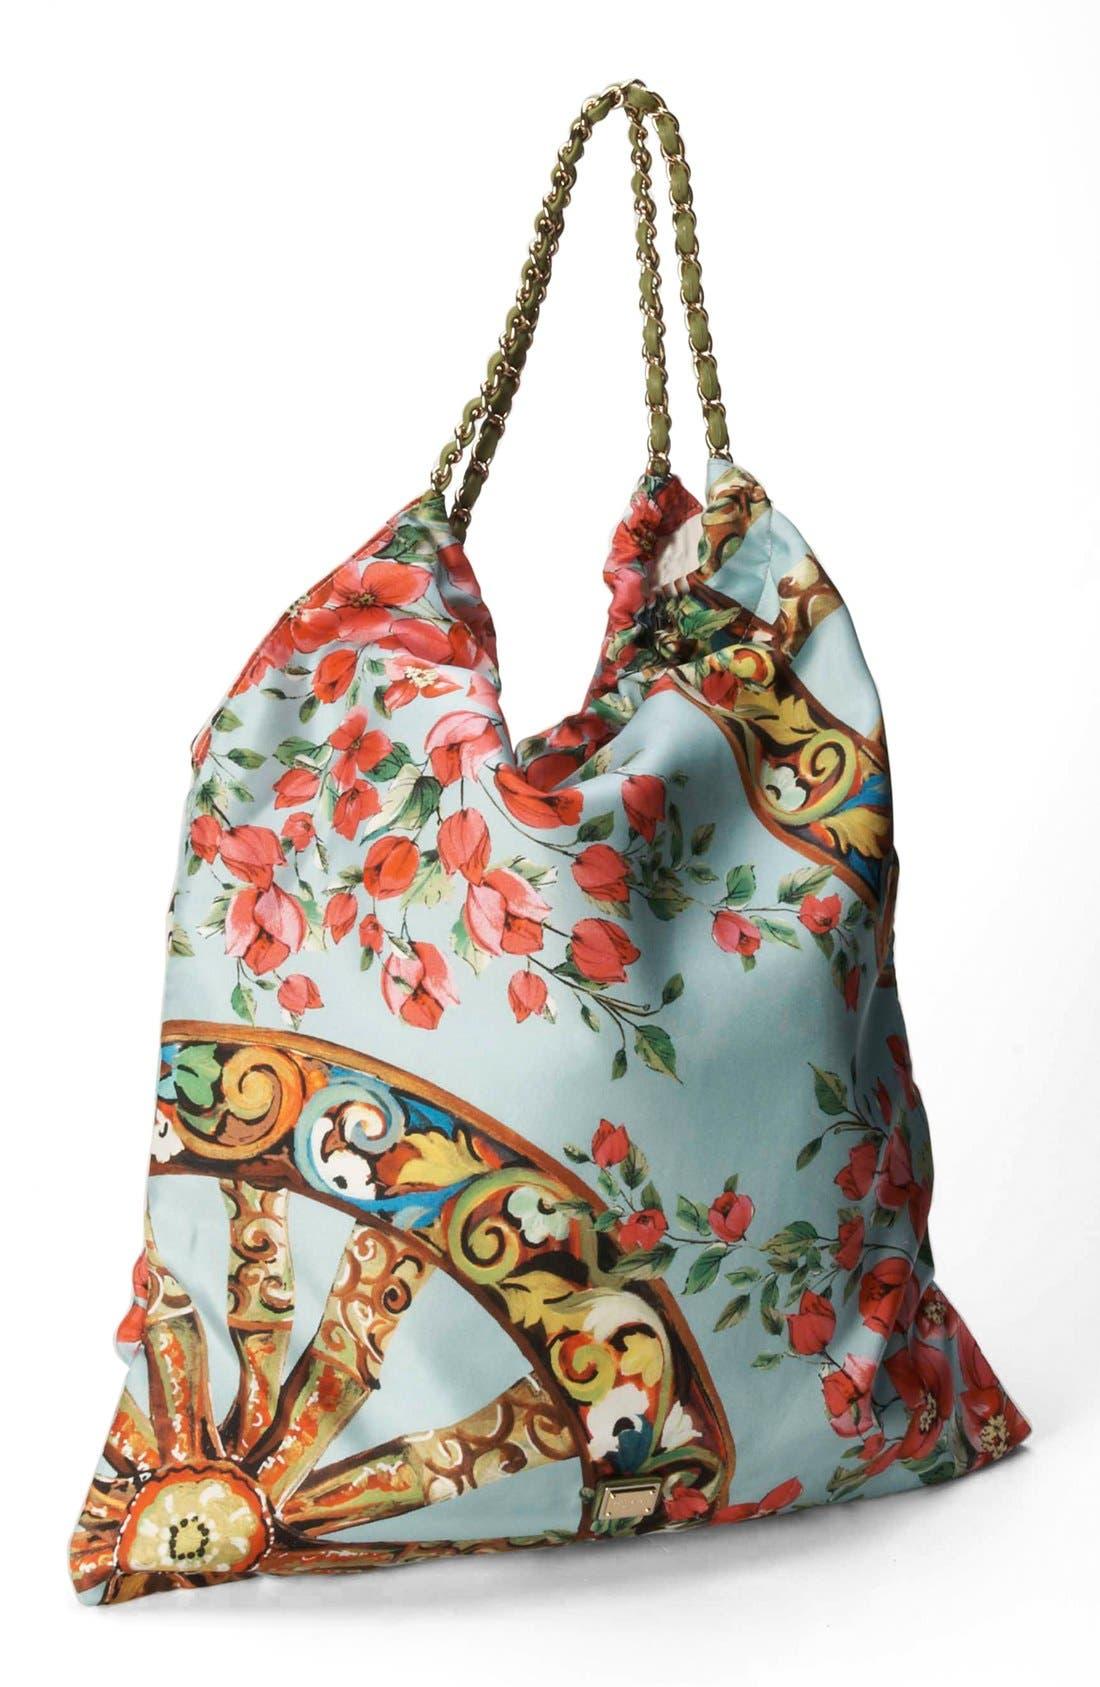 Alternate Image 1 Selected - Dolce&Gabbana 'St. Bouganville' Hobo, Large